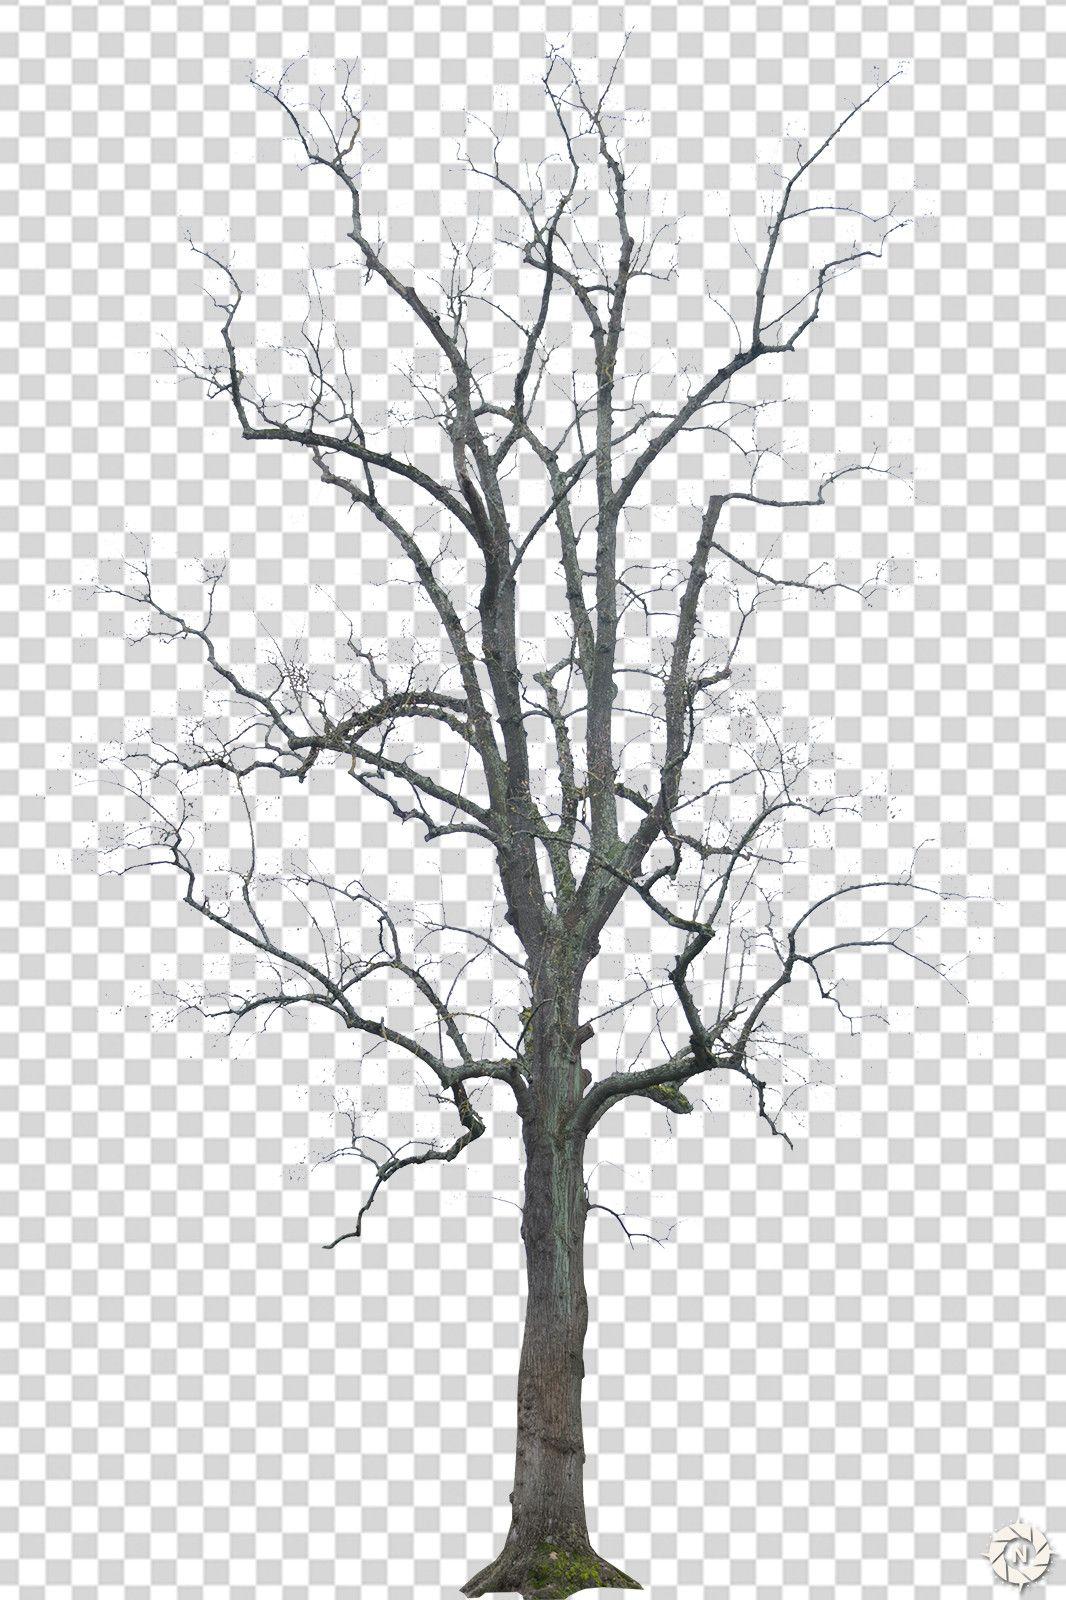 Dead Tree 02 Png Tree Photoshop Dry Tree Tree Textures